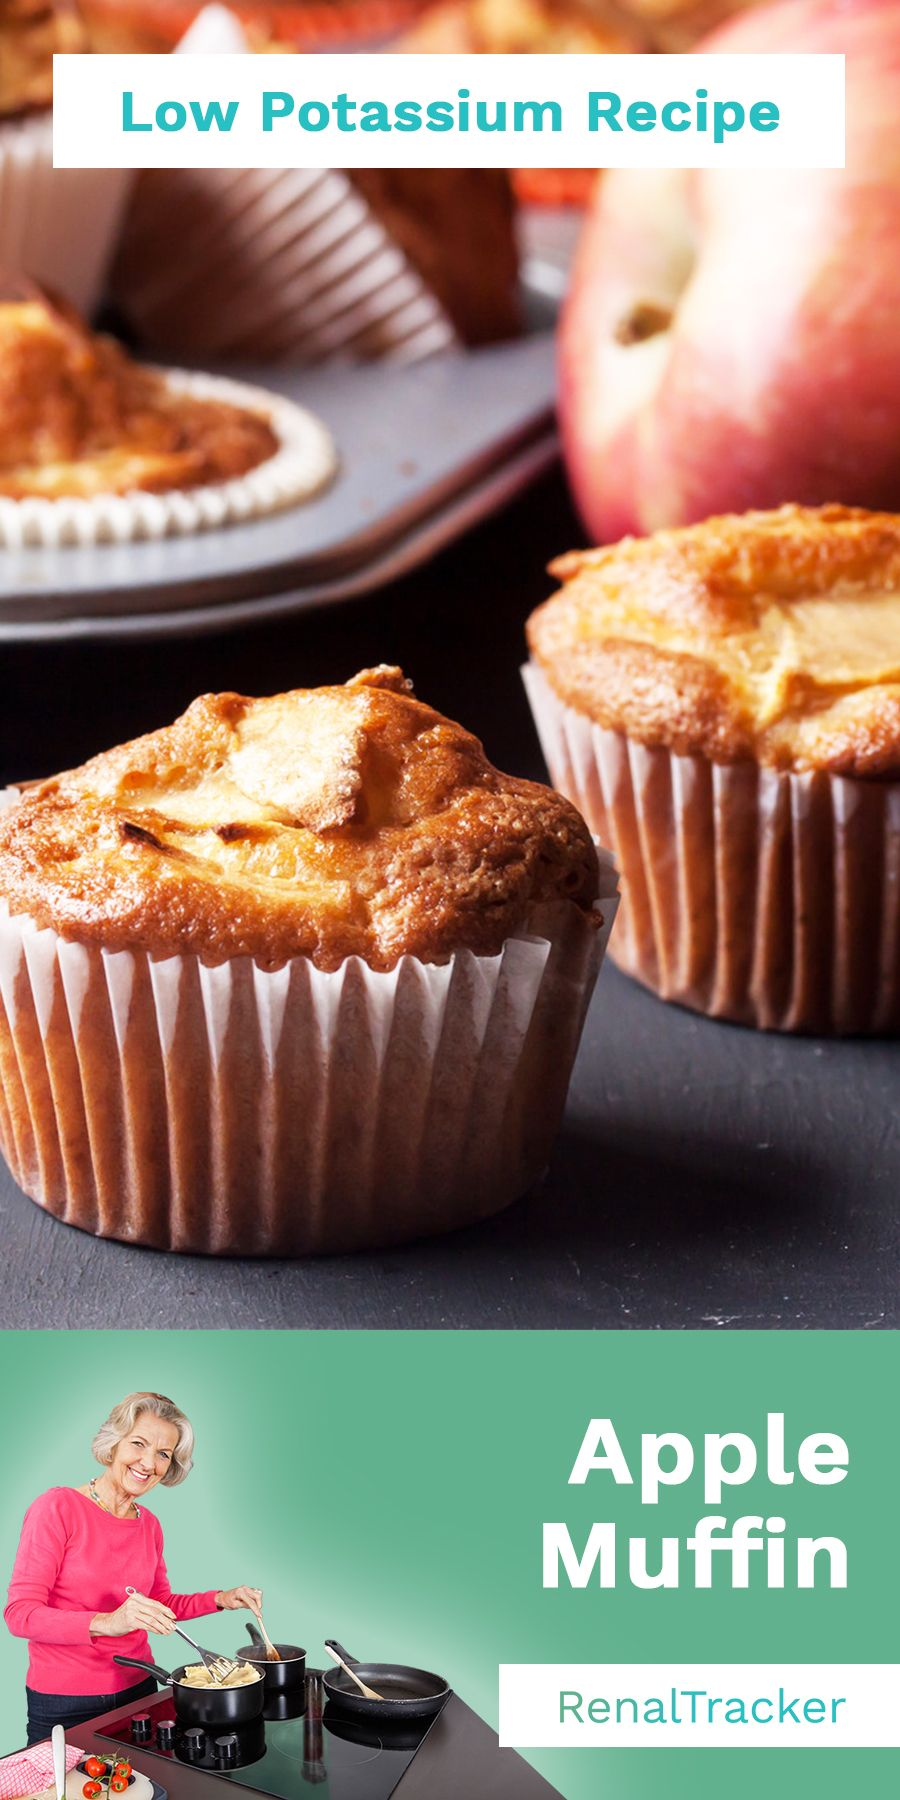 Apple muffins low potassium recipes kidney friendly